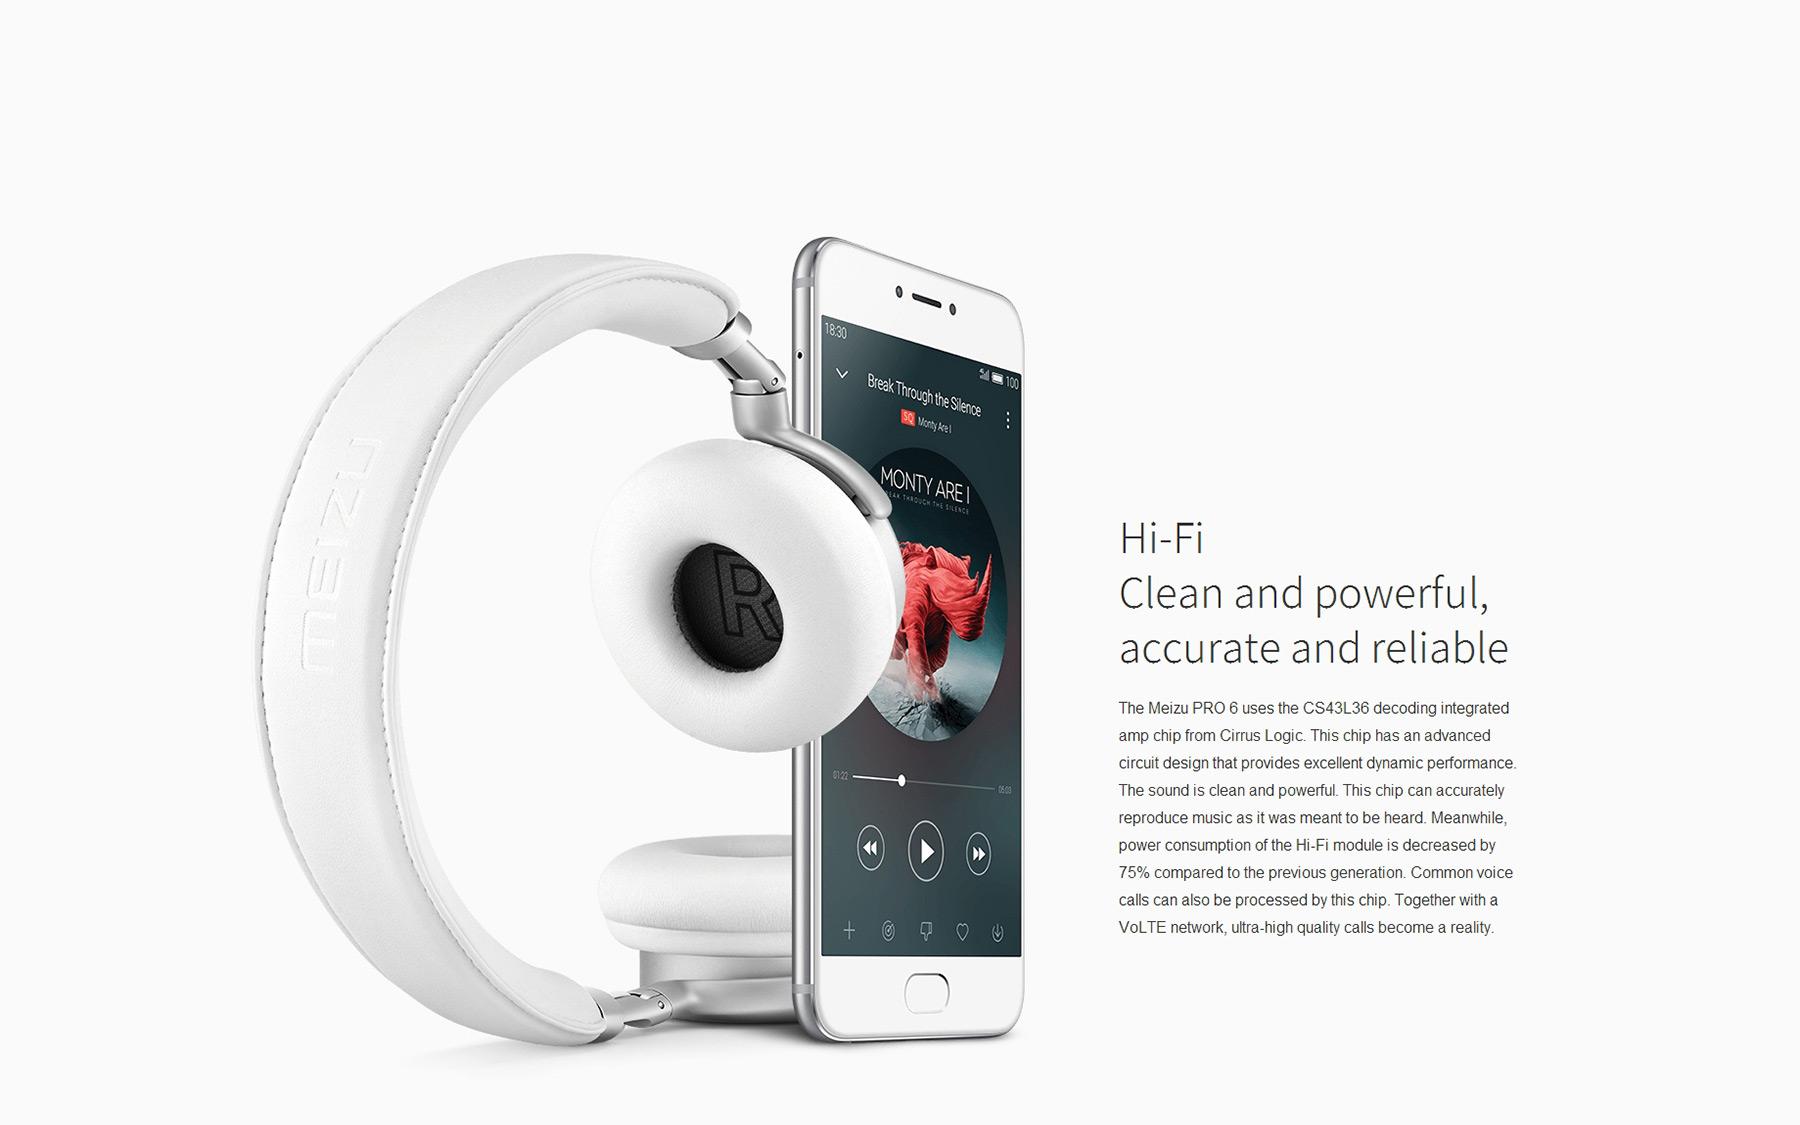 Meizu PRO 6, Antutu, Sony Kamera, China Smartphone, Neuheit, bester Preis, Preisvergleich, günstig Smartphone ohne Vertrag